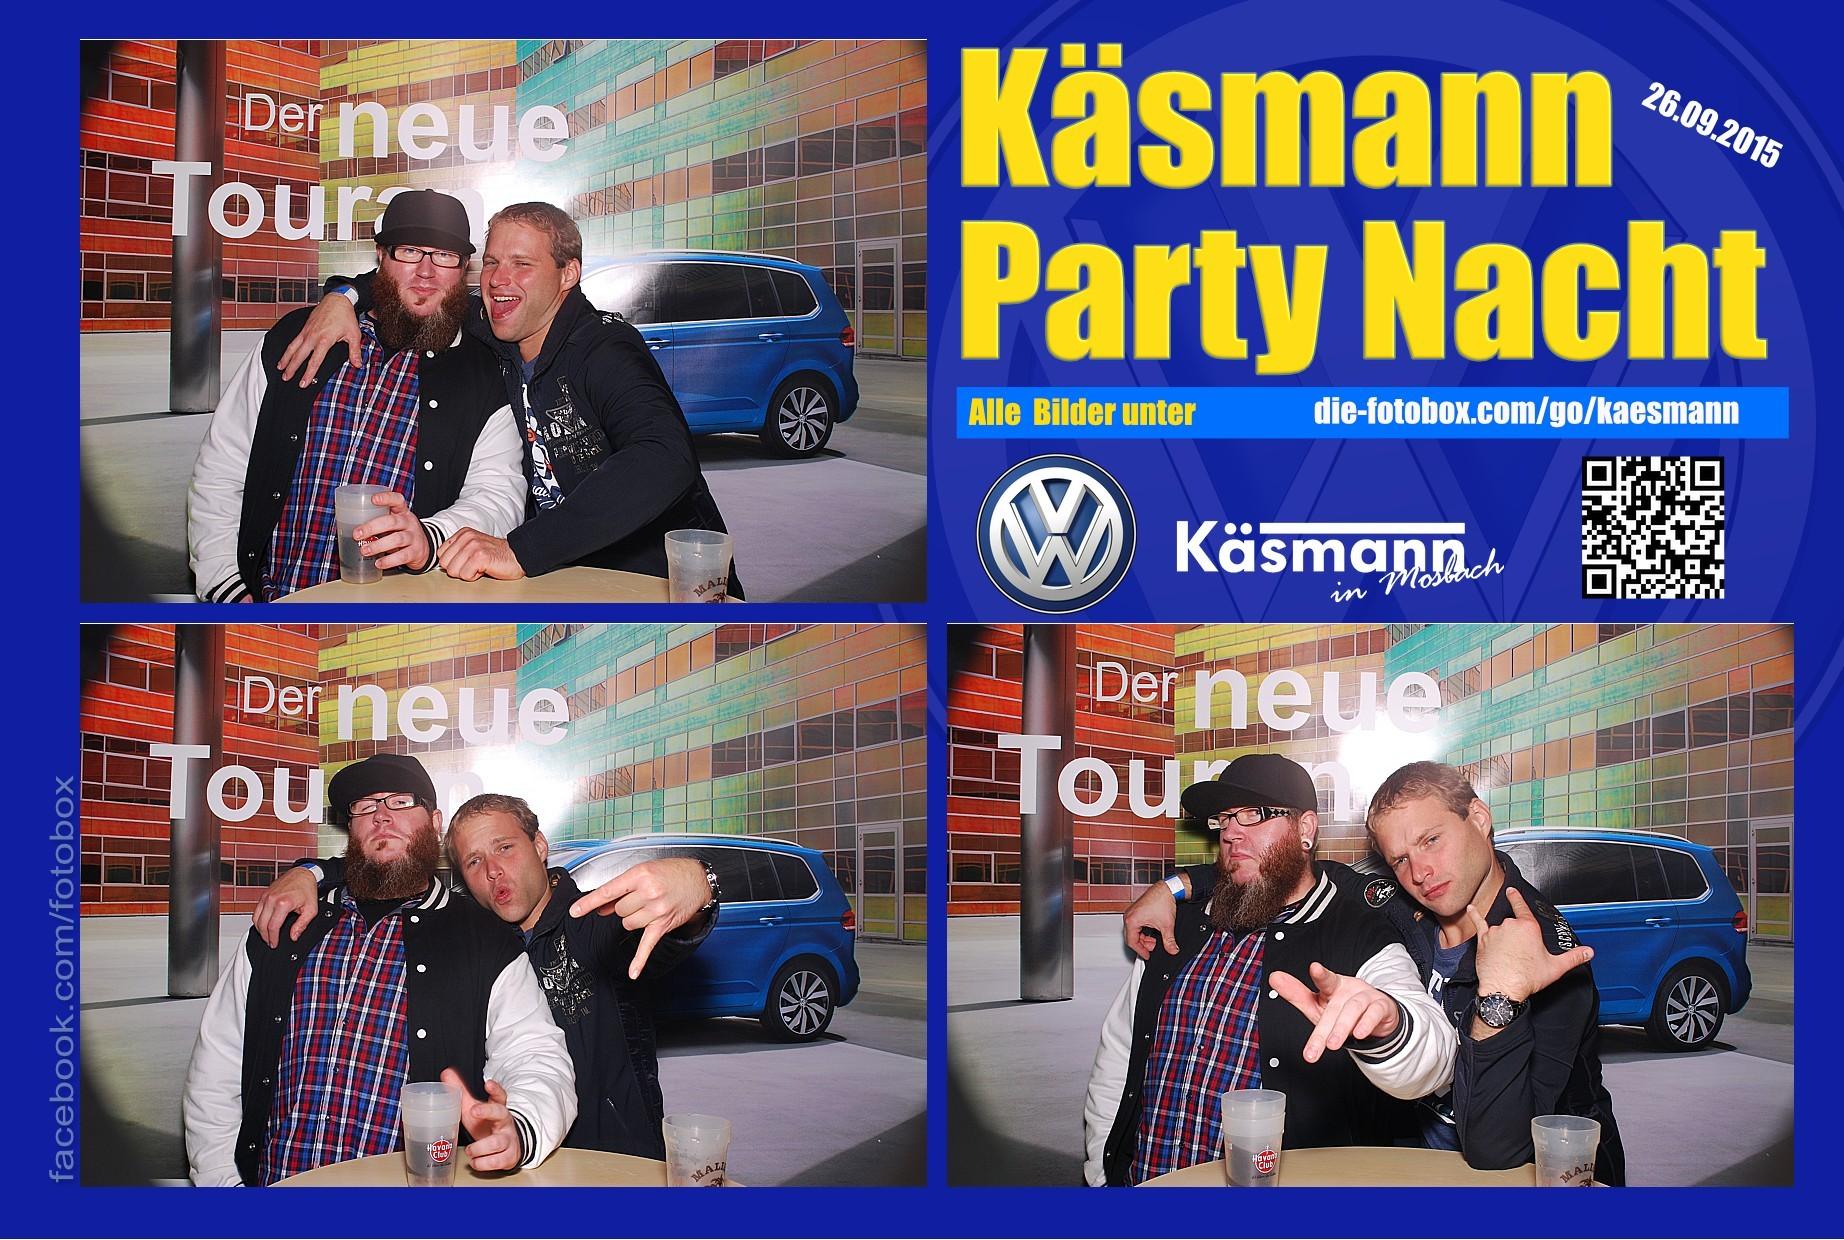 Käsmannparty 2015 - www.die-fotobox.com 01248